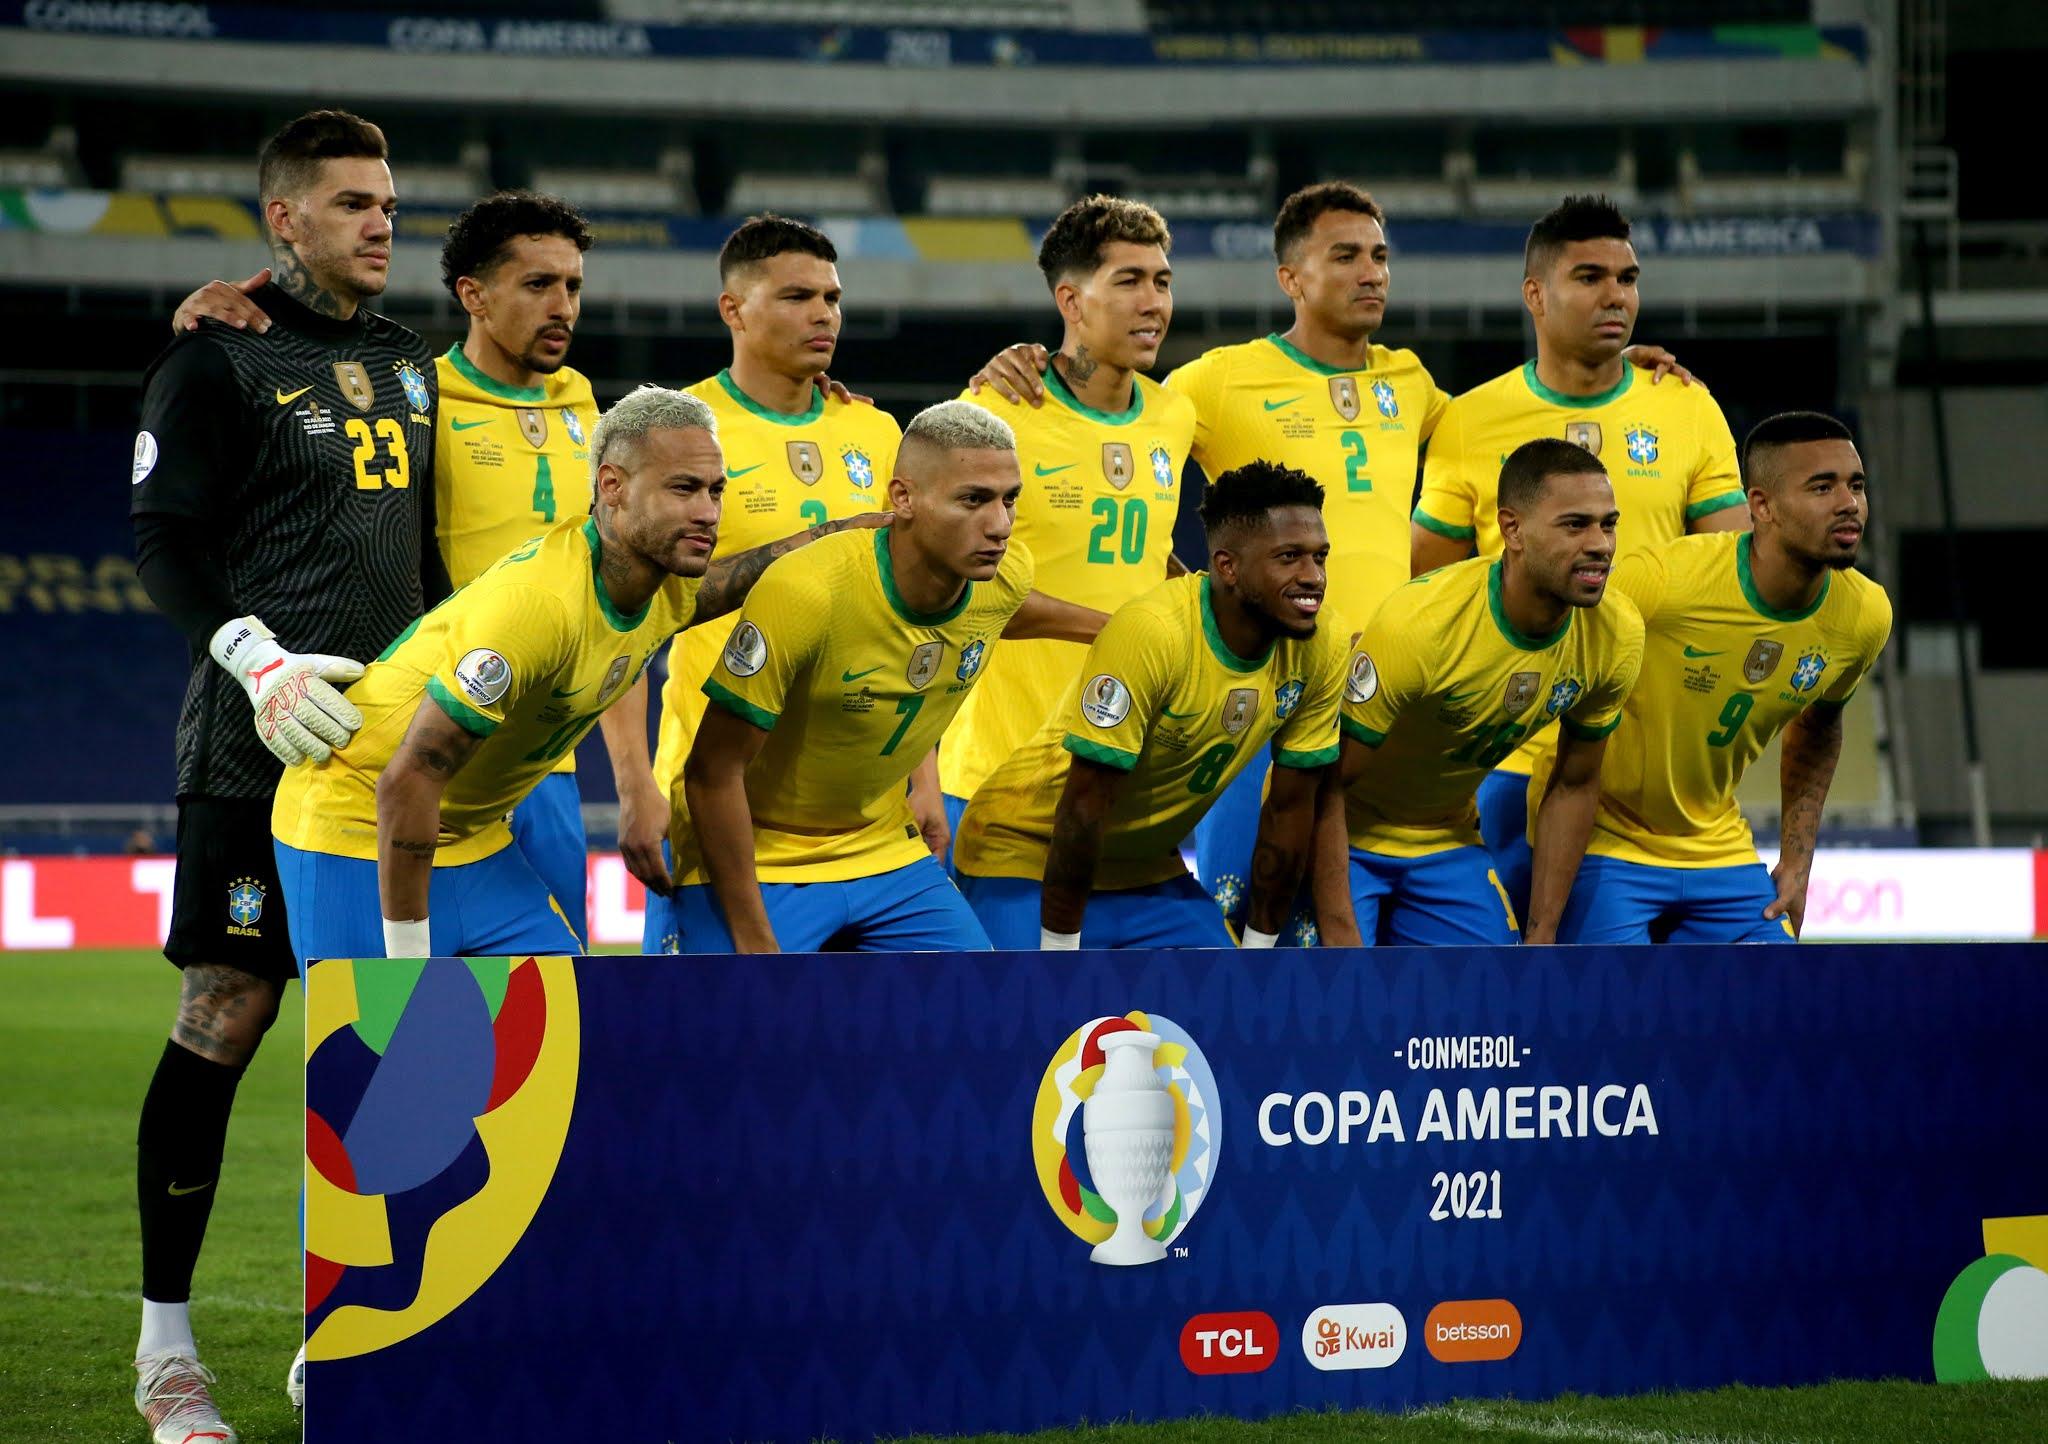 Formación de Brasil ante Chile, Copa América 2021, 2 de julio